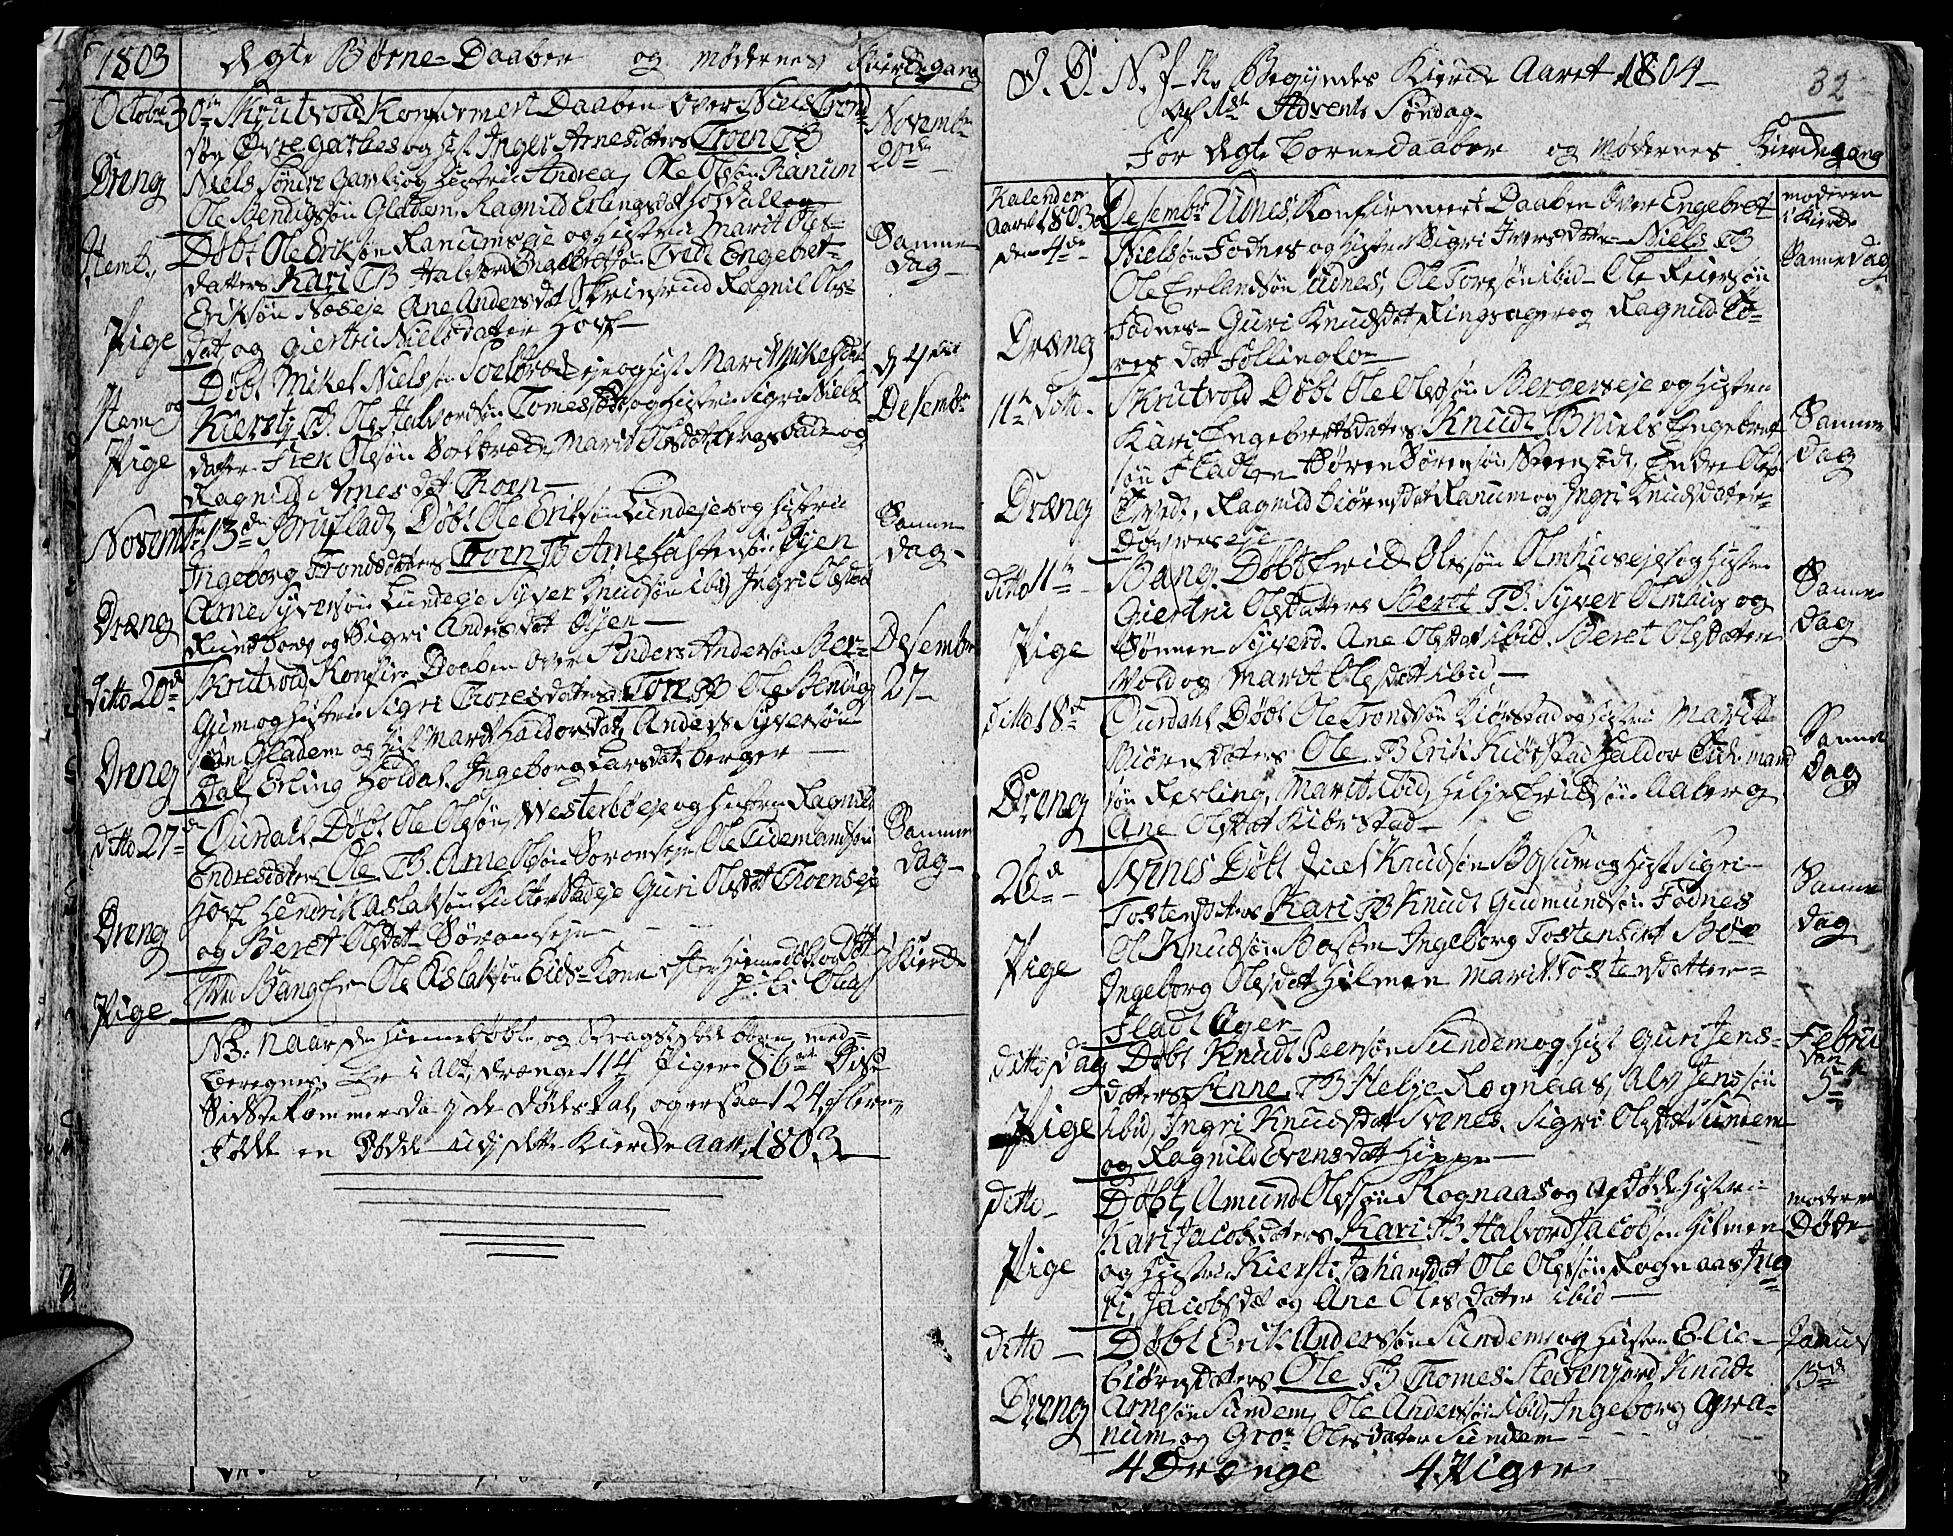 SAH, Aurdal prestekontor, Ministerialbok nr. 7, 1800-1808, s. 32